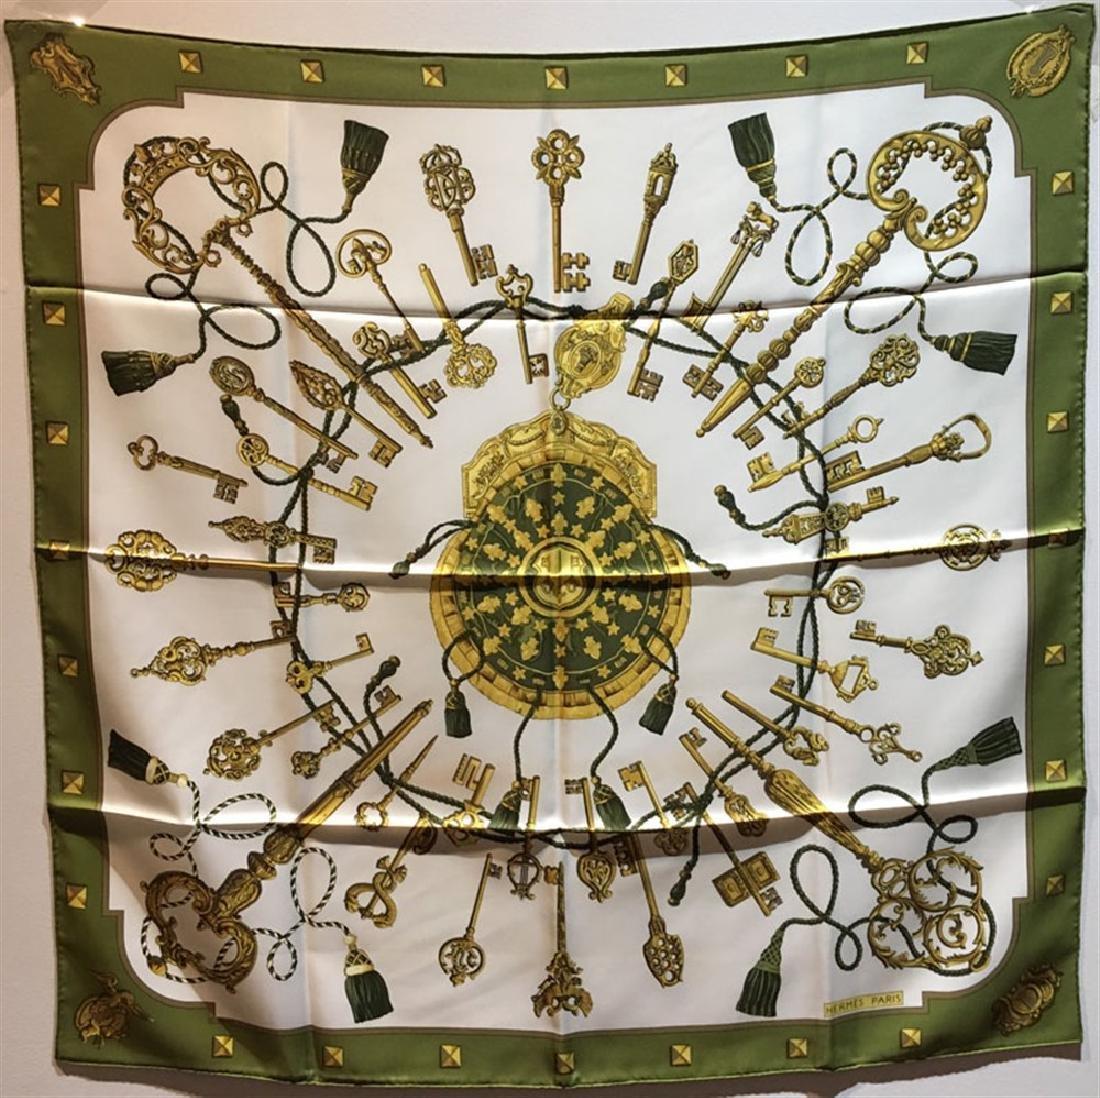 Hermes Vintage Les Cles Keys Silk Scarf in Chartreuse